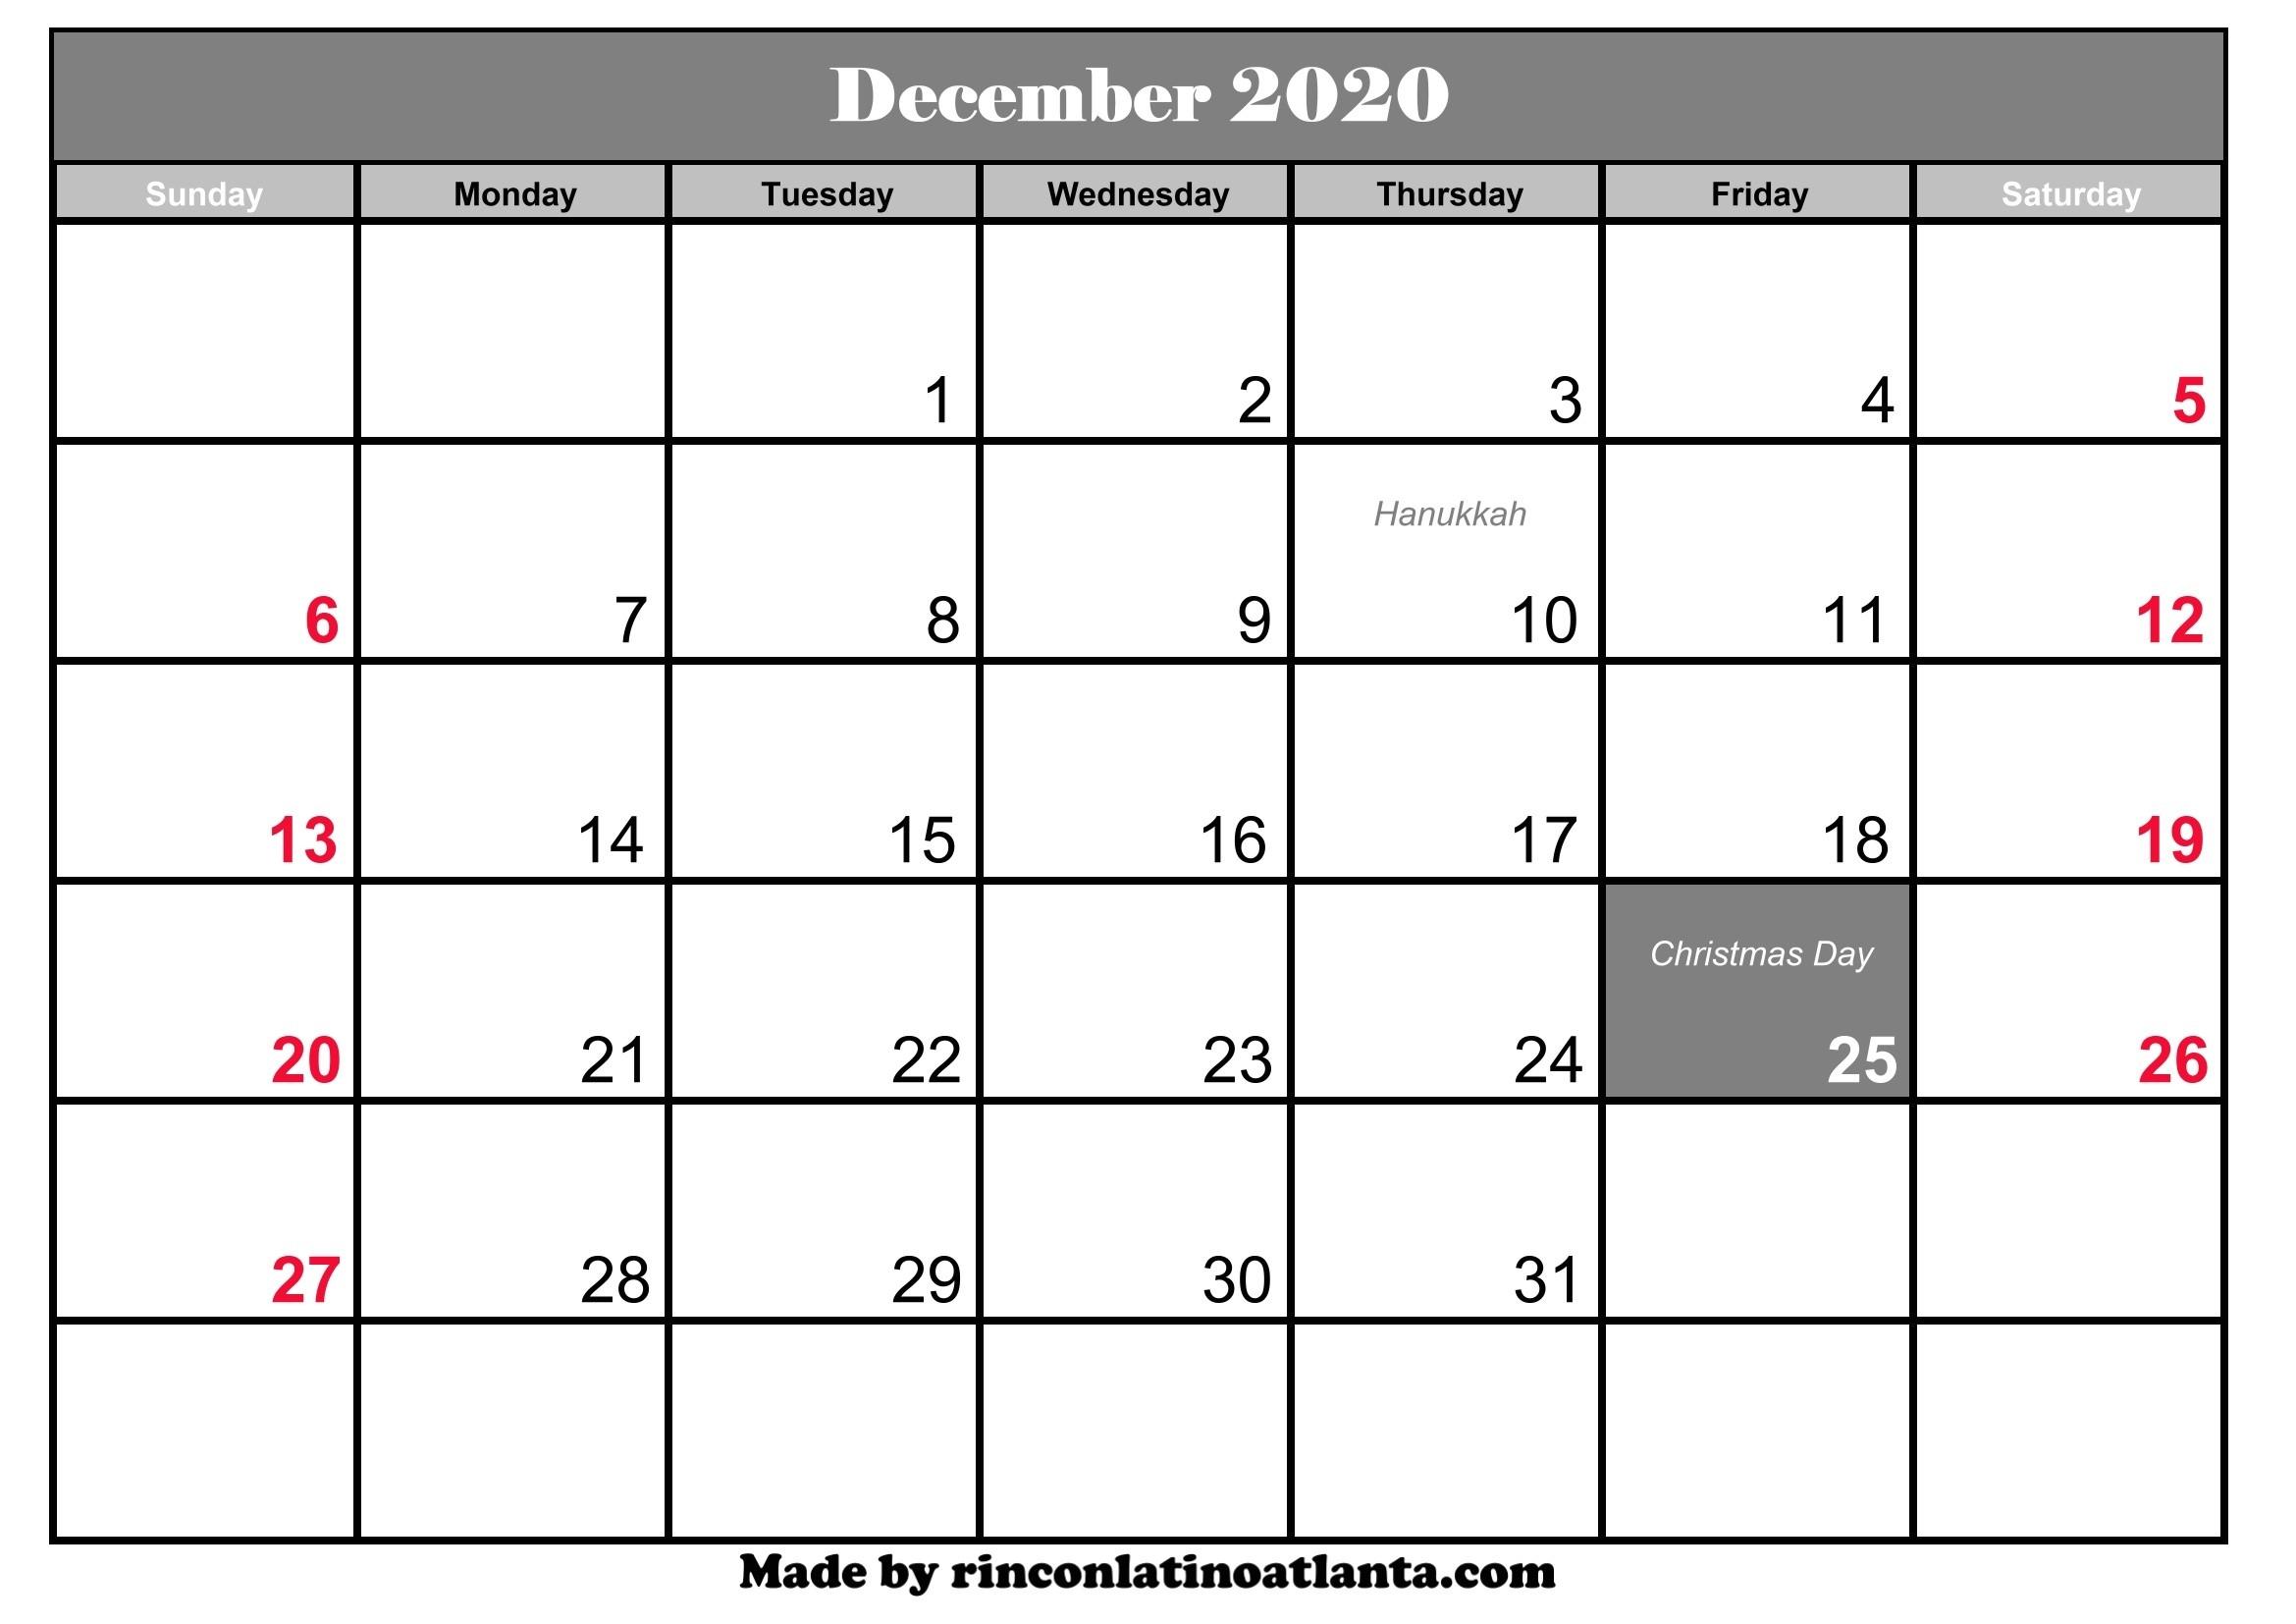 Free Printable 2020 2020 Calendar - Baeti-Printable Monthly Calendar Templates Uk